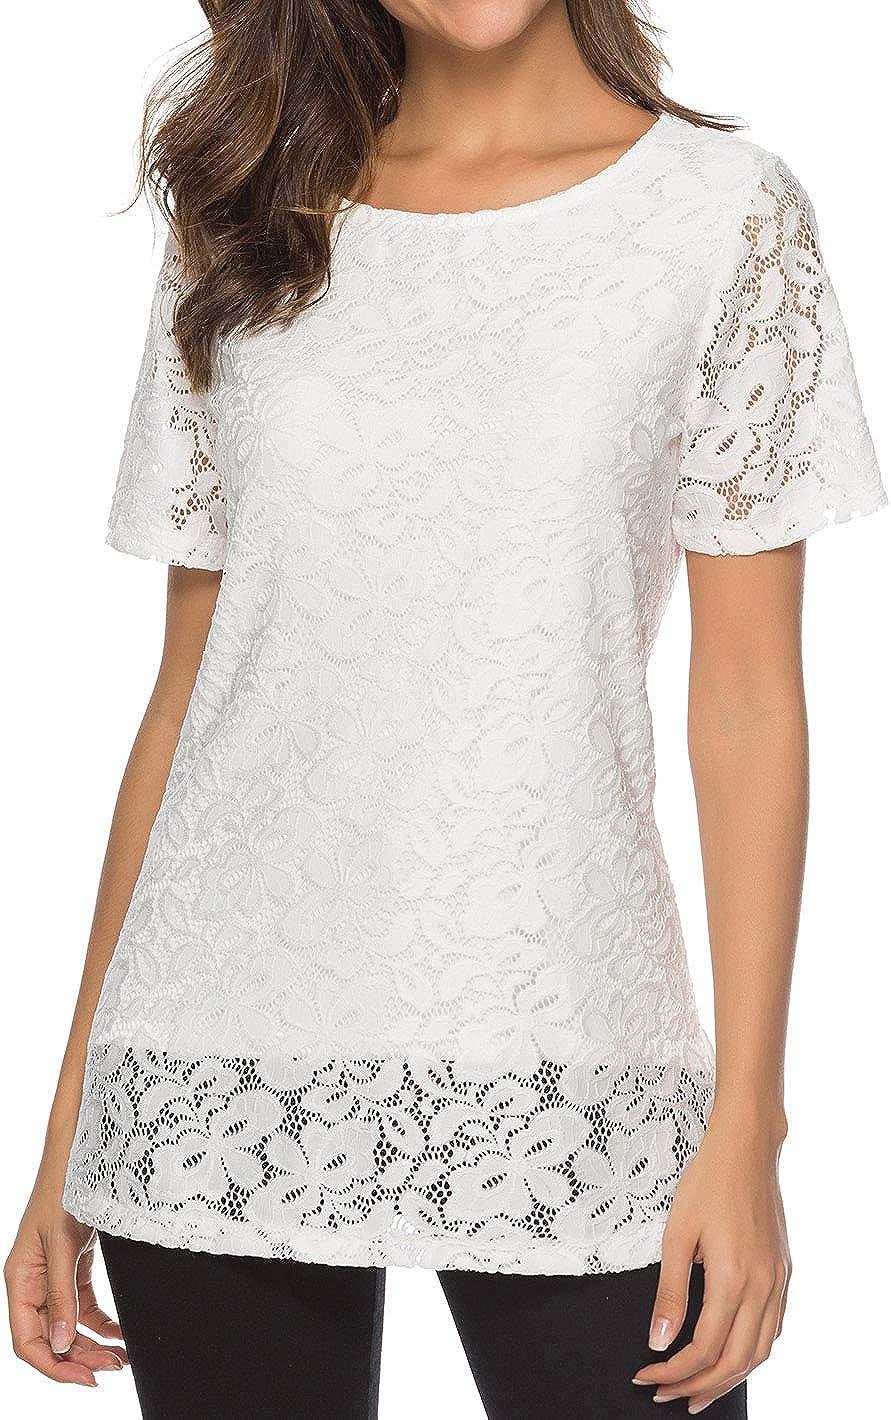 koitmy Women's Short Sleeve Round Neck Lace T-Shirt Blouse Tunics Tops